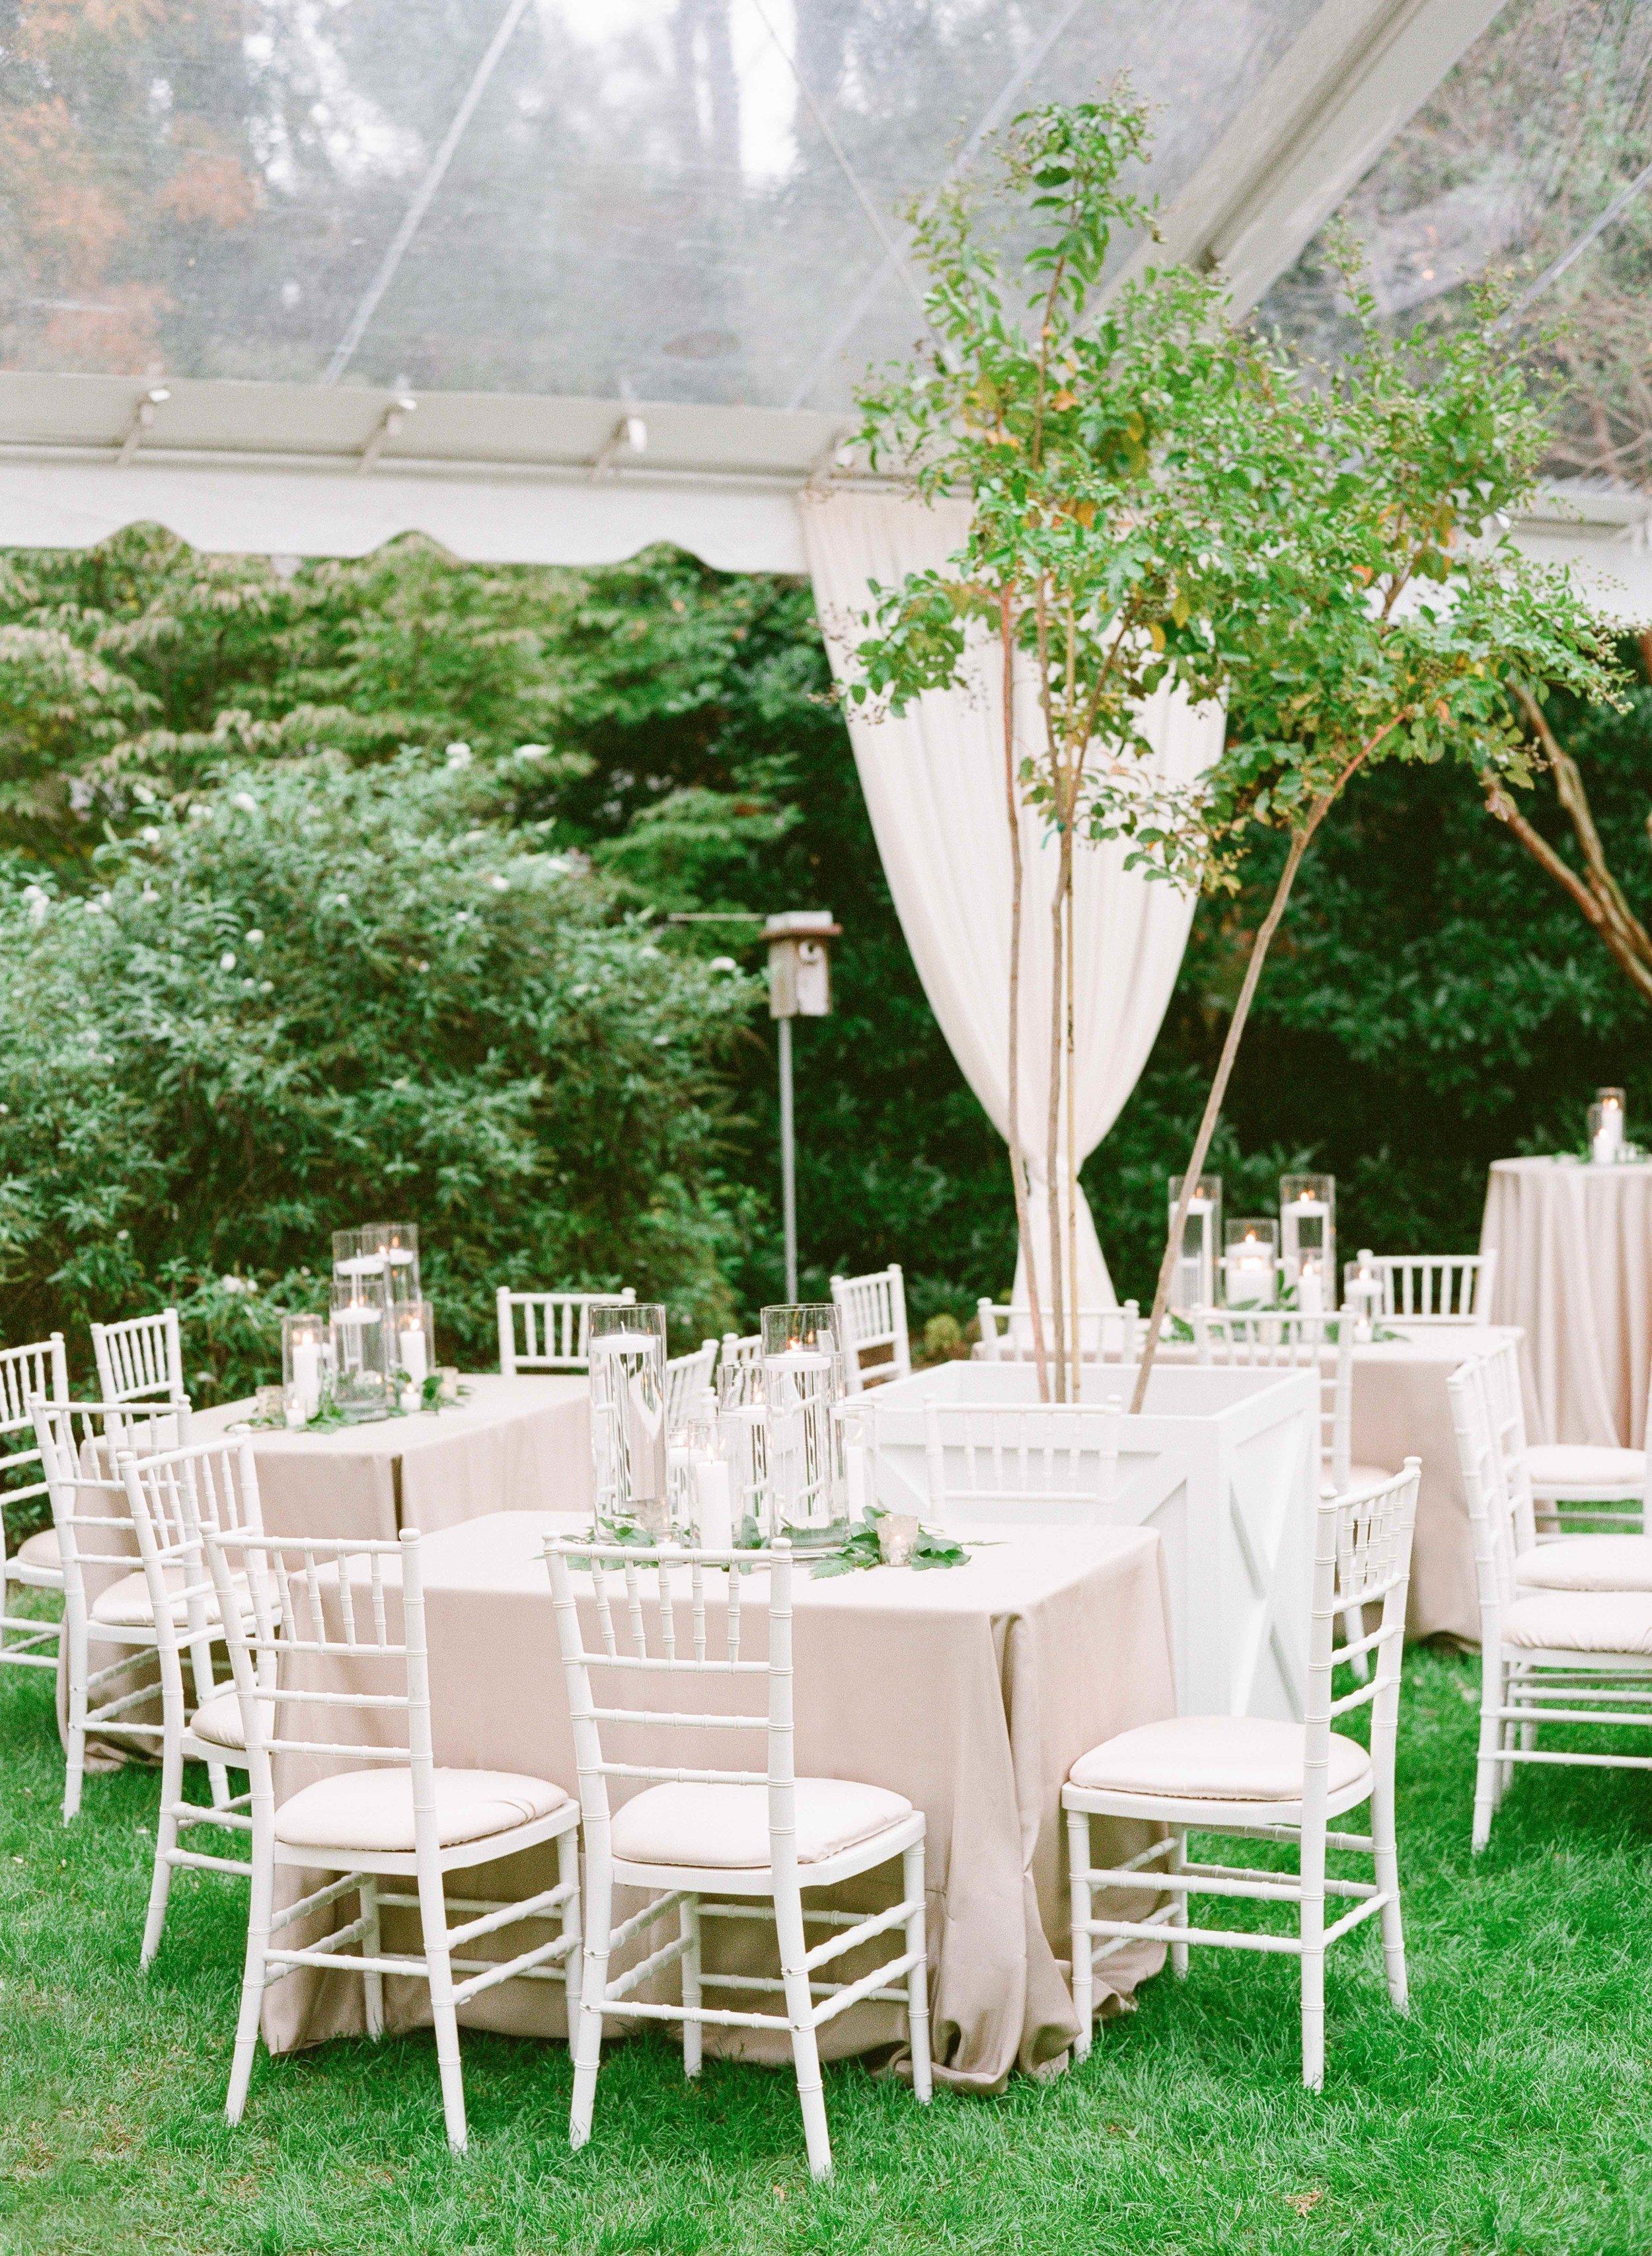 raleigh_nc_wedding_photographer_film_caseyrosephotography_sydbuzz_189.jpg